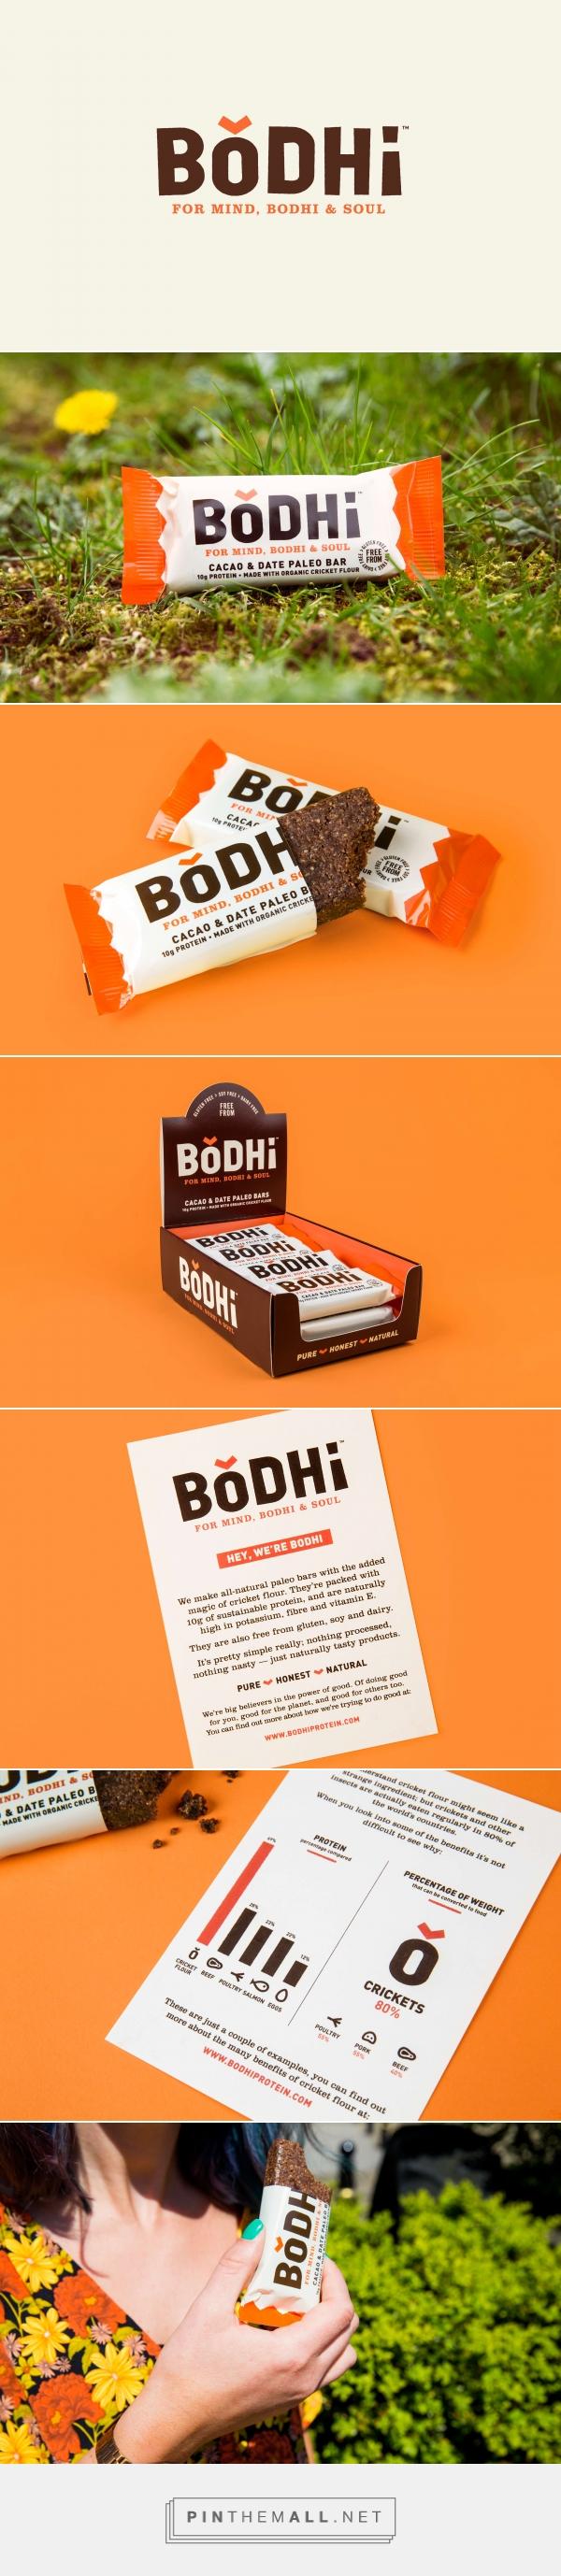 Bodhi | Branding & Packaging Design | Designed by Robot Food | www.robot-food.com - created via https://pinthemall.net